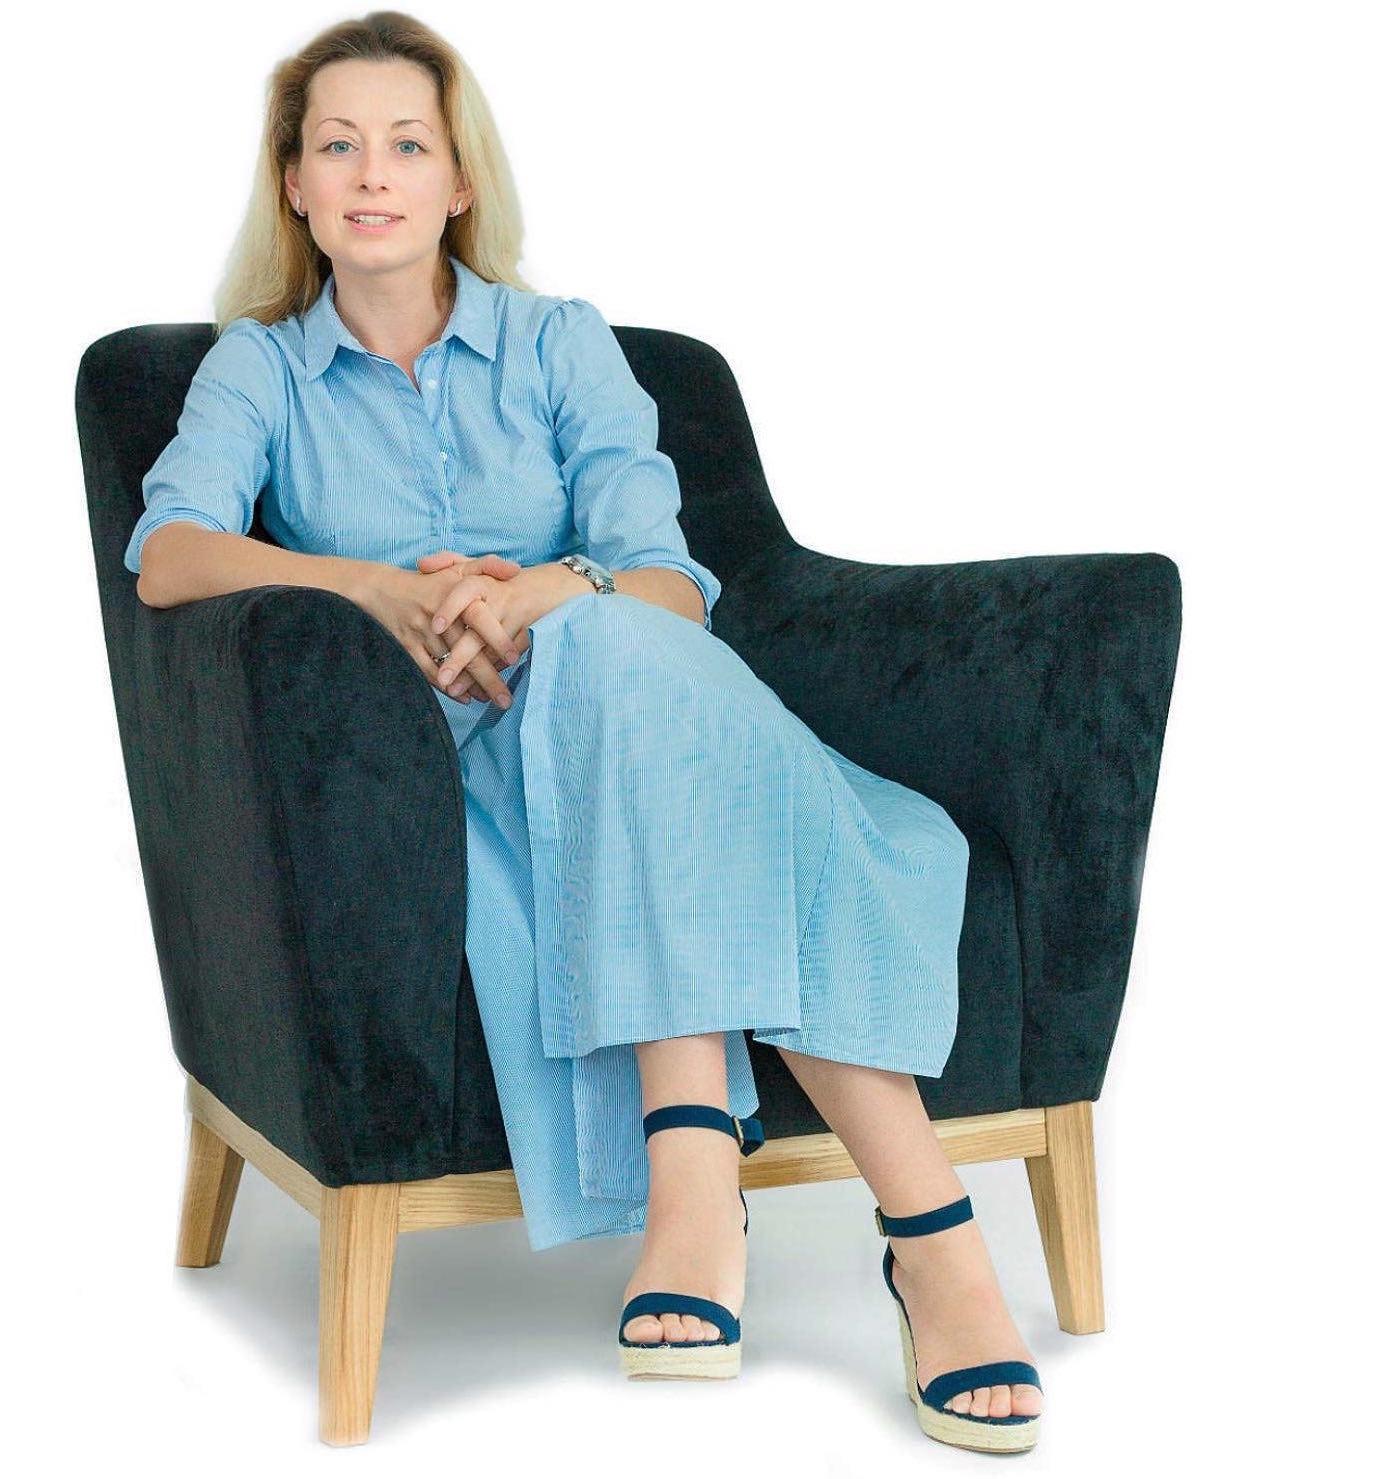 Психолог Надежда Табакова